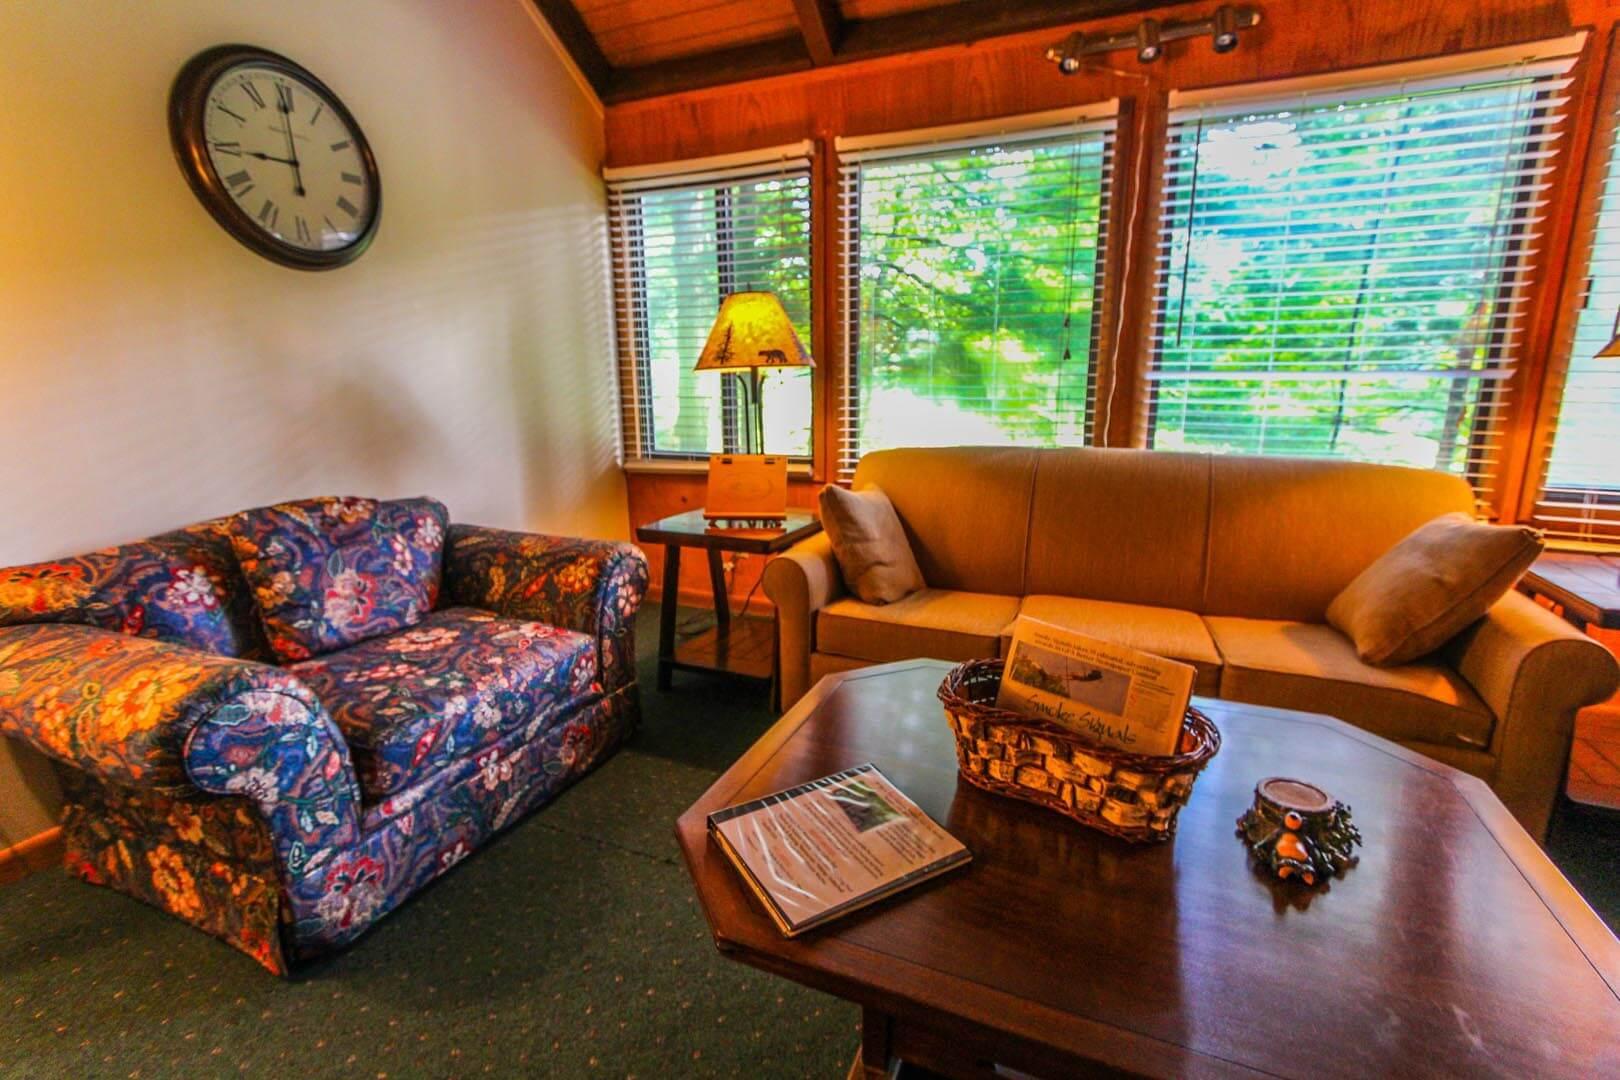 A vibrant living room at VRI's Golf Club Villas in Marble Hill, Georgia.